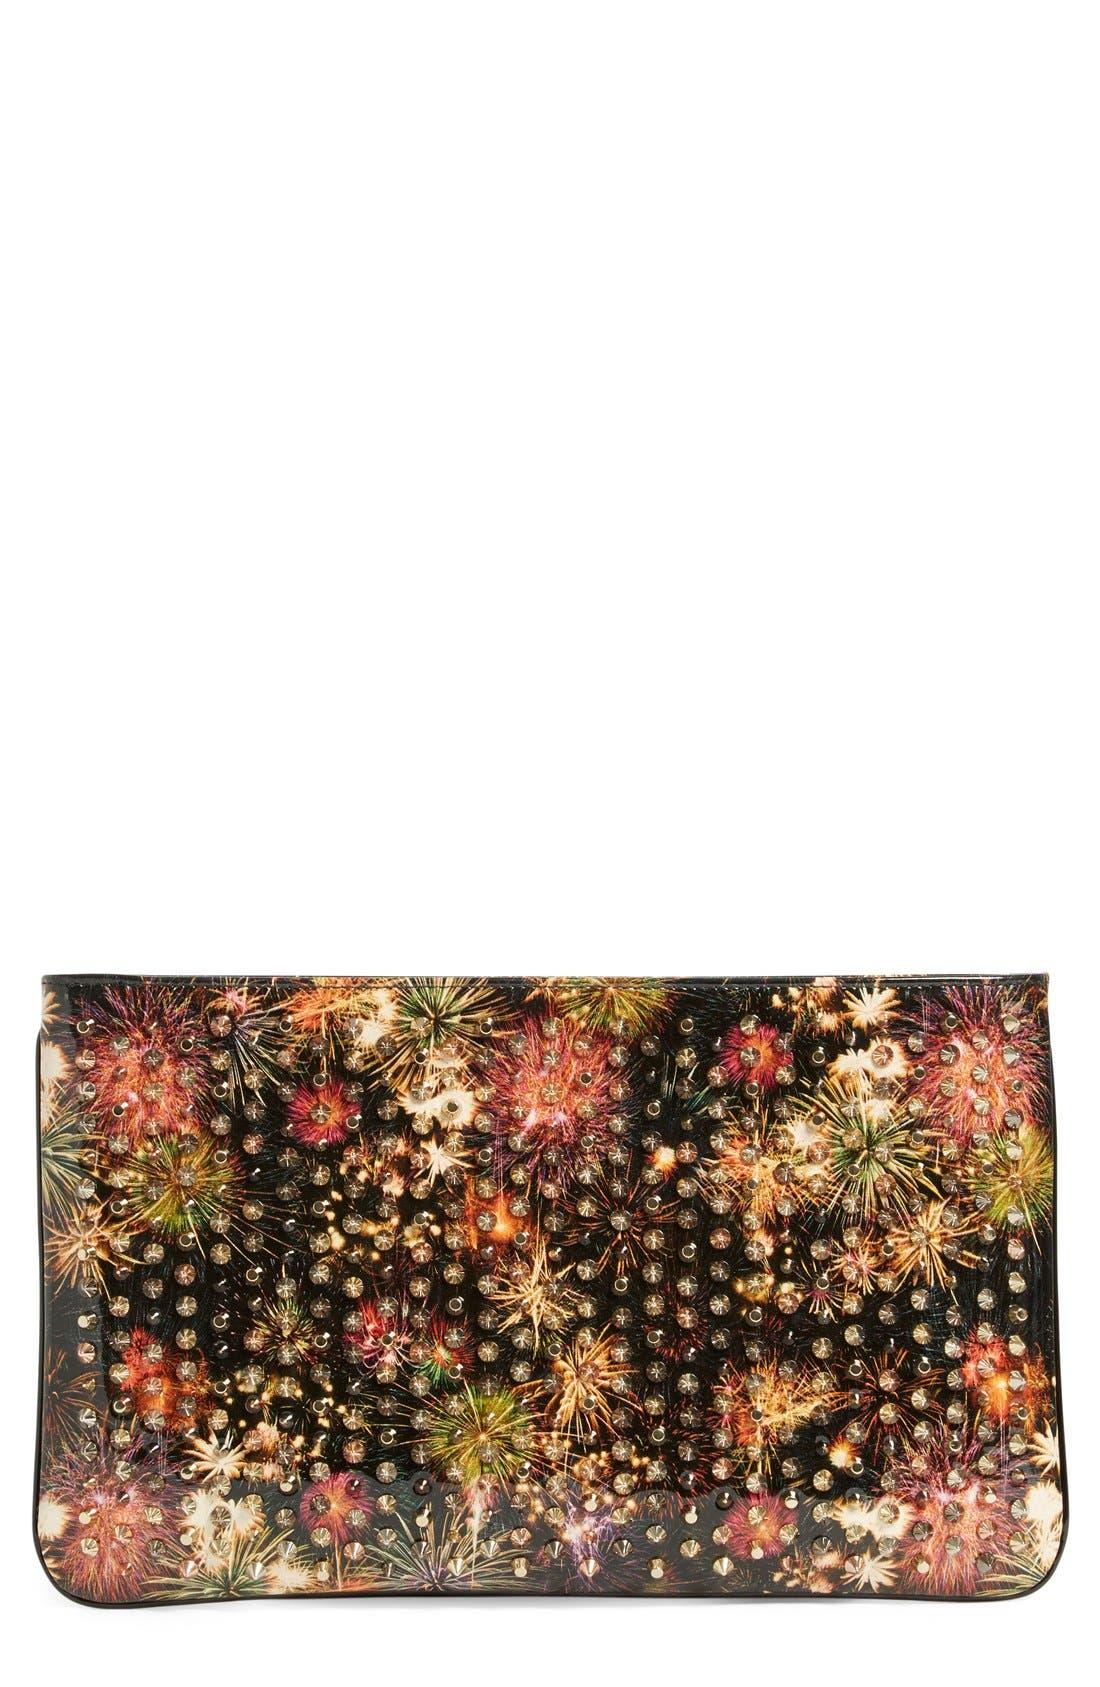 Alternate Image 1 Selected - Christian Louboutin 'Loubiposh - Firework' Clutch